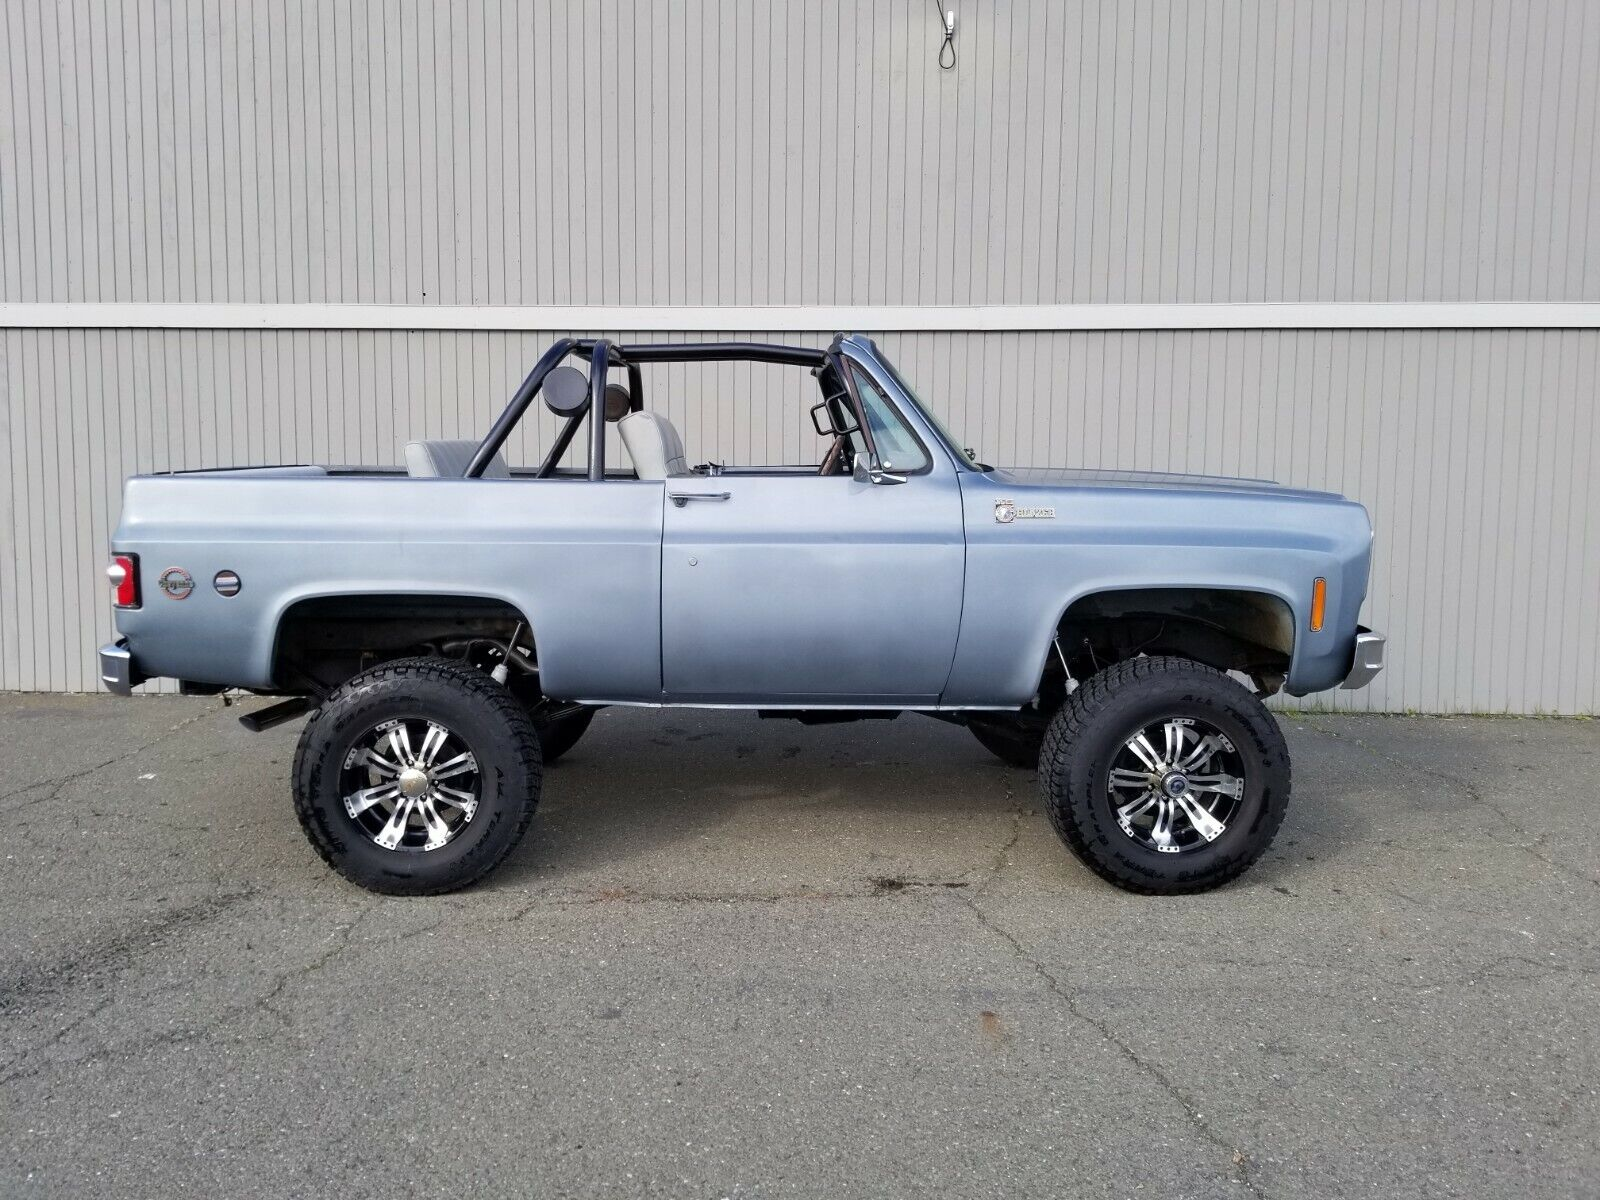 1975 Chevrolet Blazer  1975 Chevrolet Blazer K5 , 383ci-V8, Auto, 4x4, 64k miles, Silver